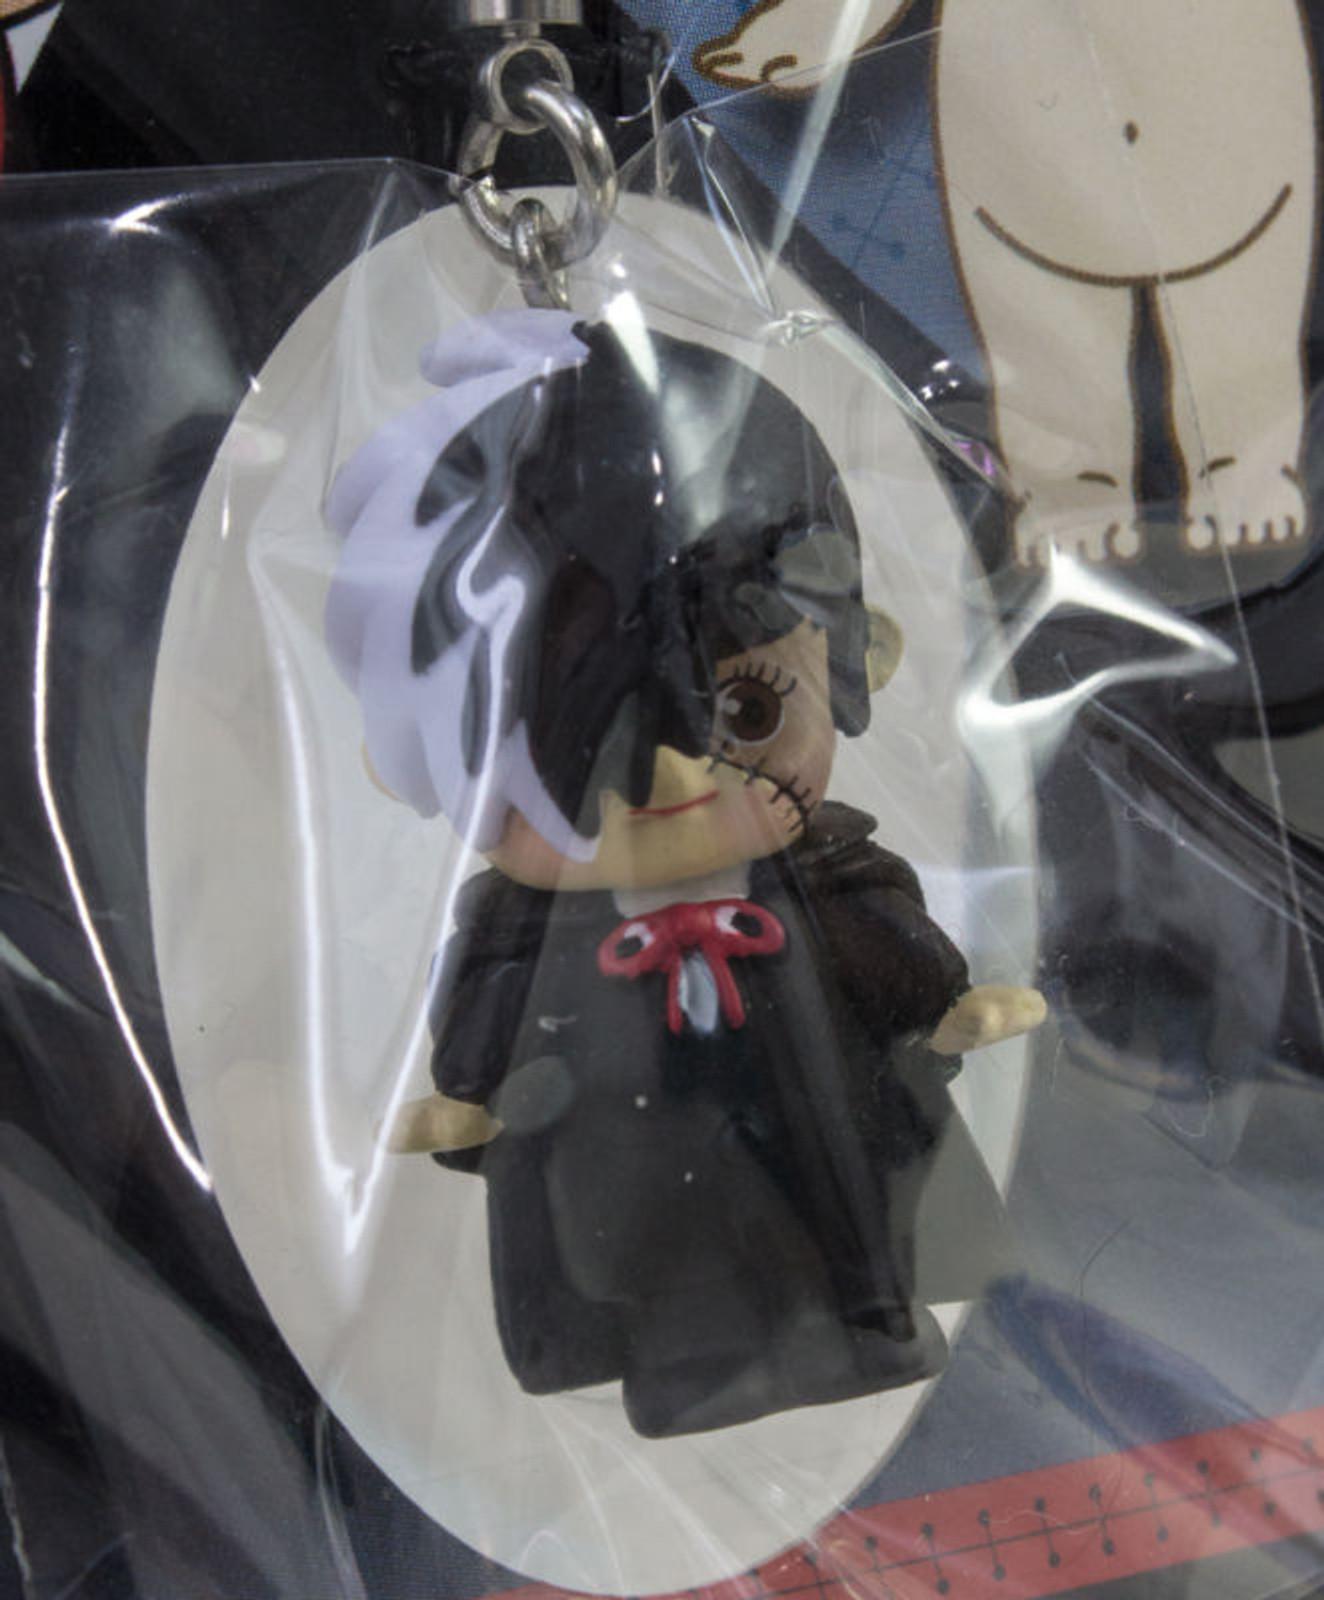 Black Jack Rose O'neill Kewpie Kewsion Strap JAPAN ANIME